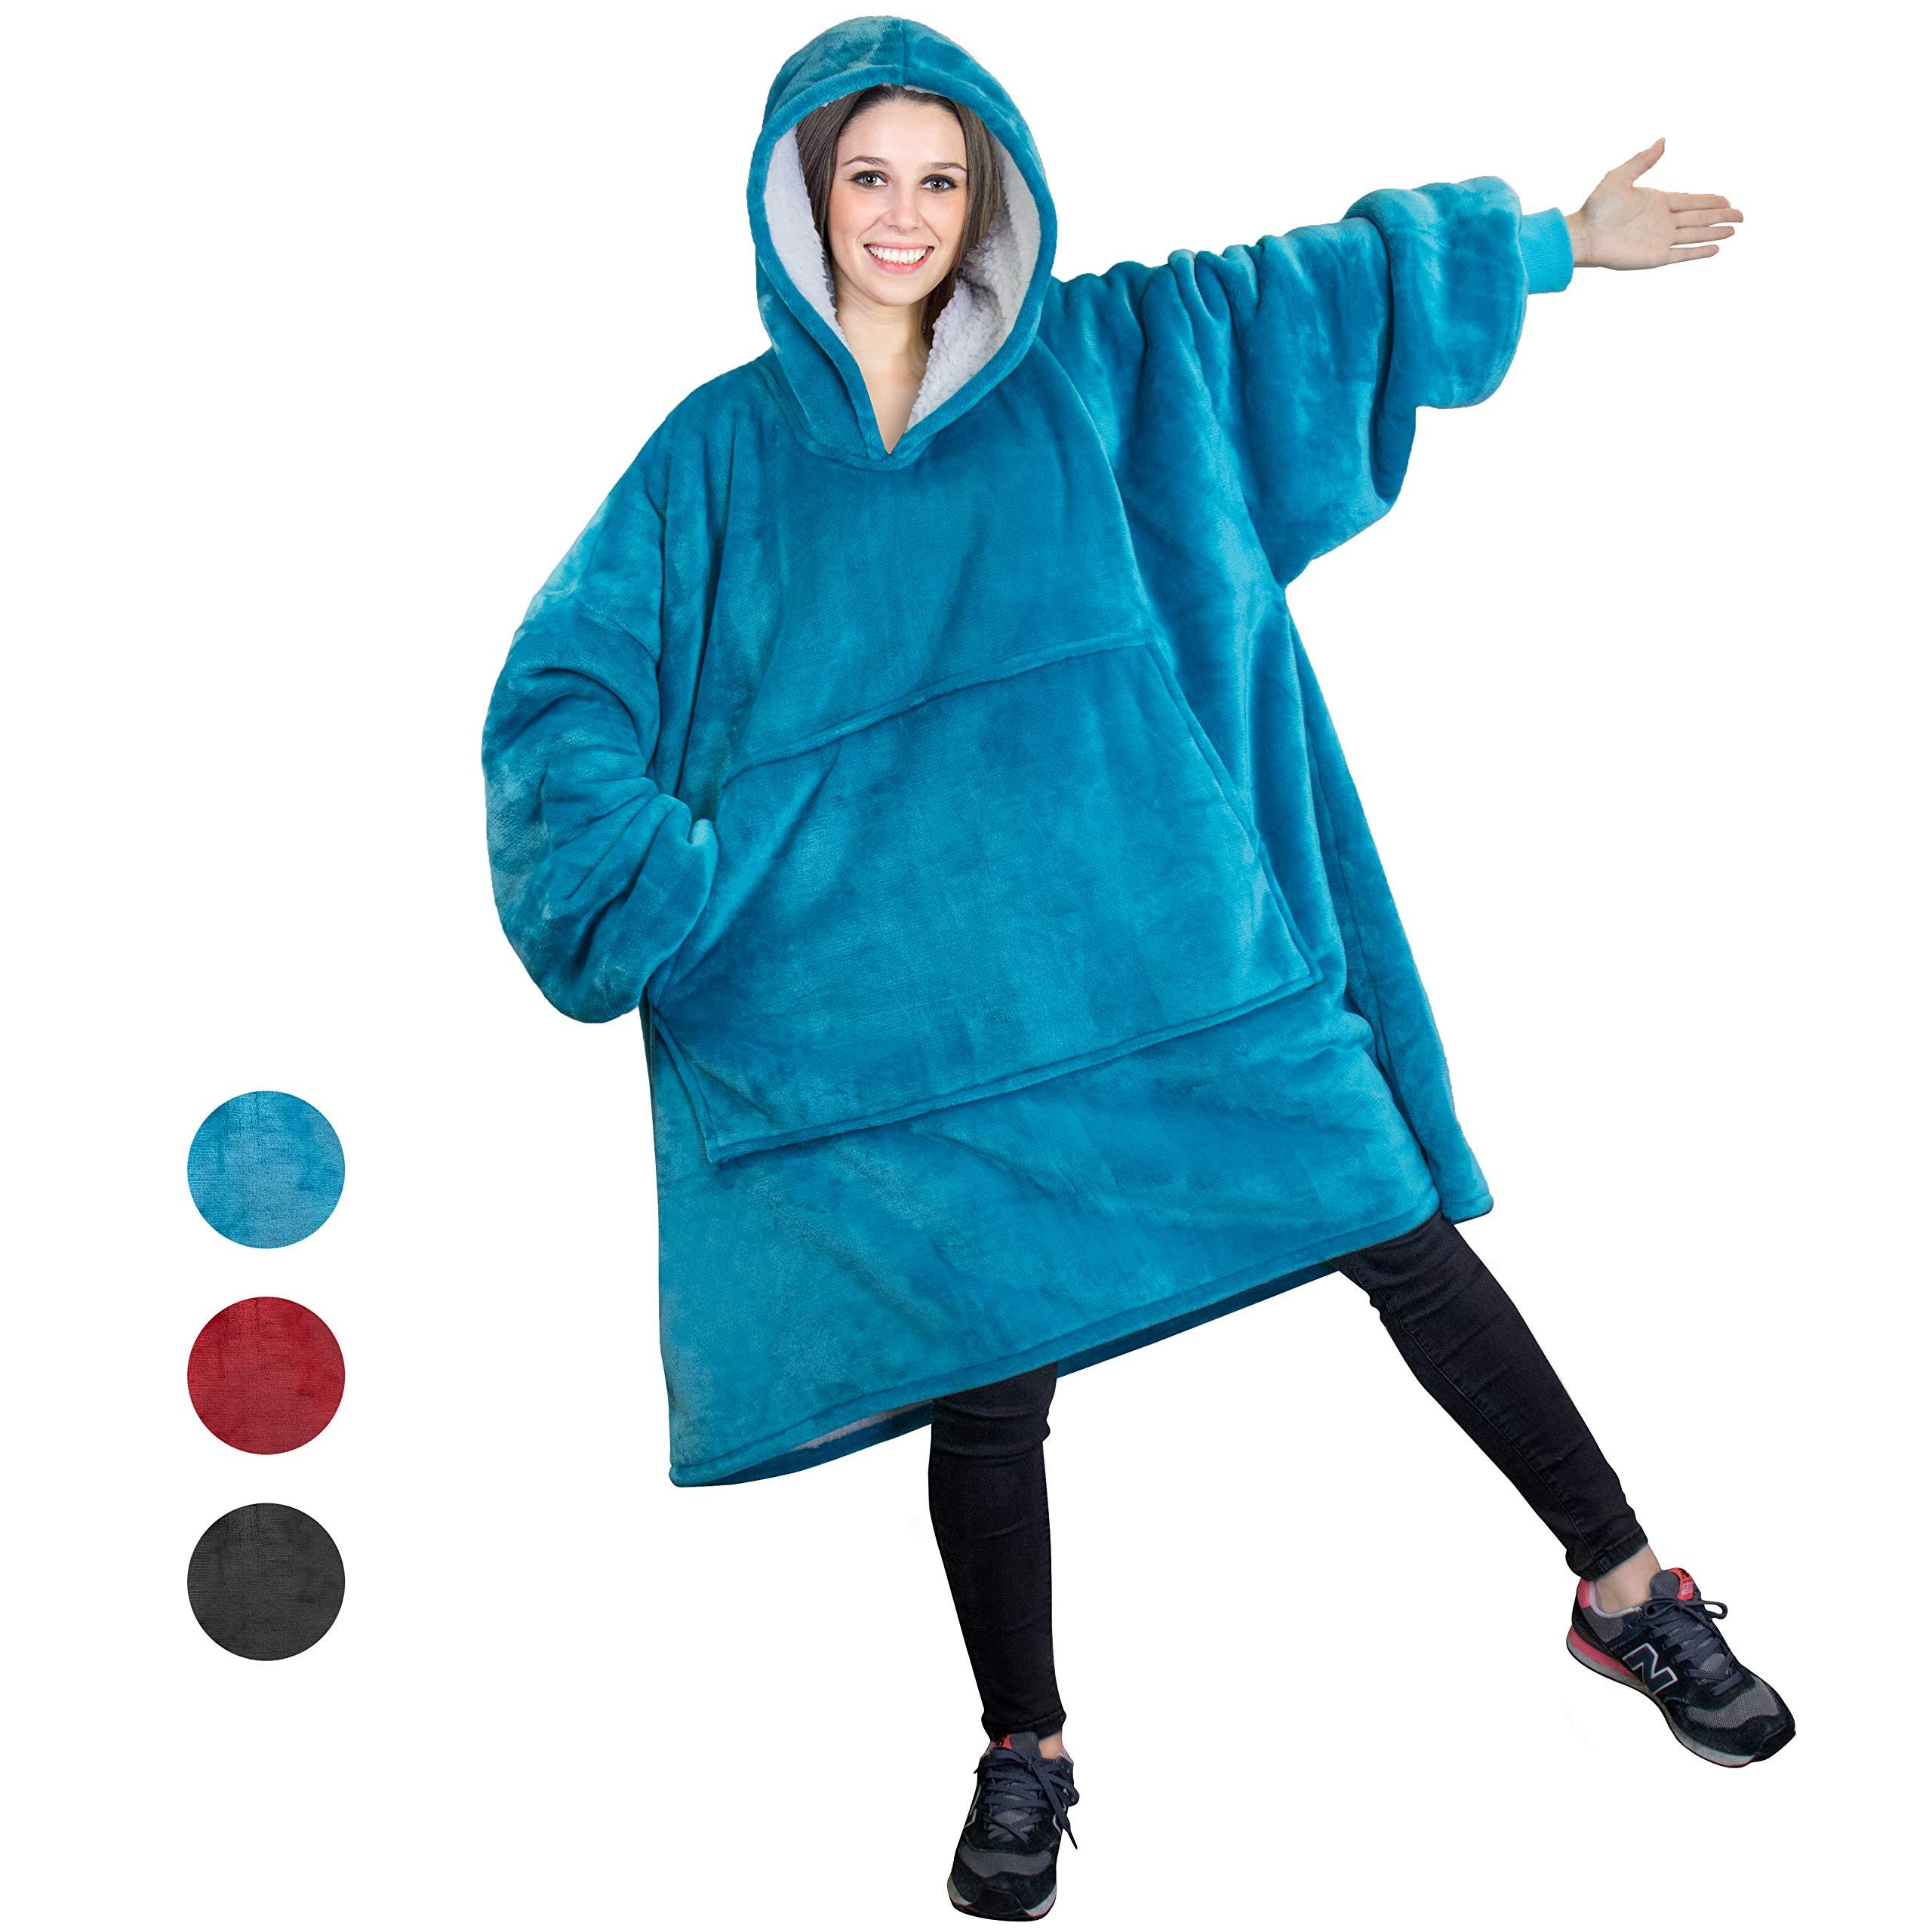 PAVILIA Sherpa Fleece Hoodie Blanket Sweatshirt for Adult Women and Men | Comfy, Cozy, Warm, Plush, Reversible | Turquoise Oversized Wearable Throw Blanket with Hood and Giant Pocket (Sea Blue)